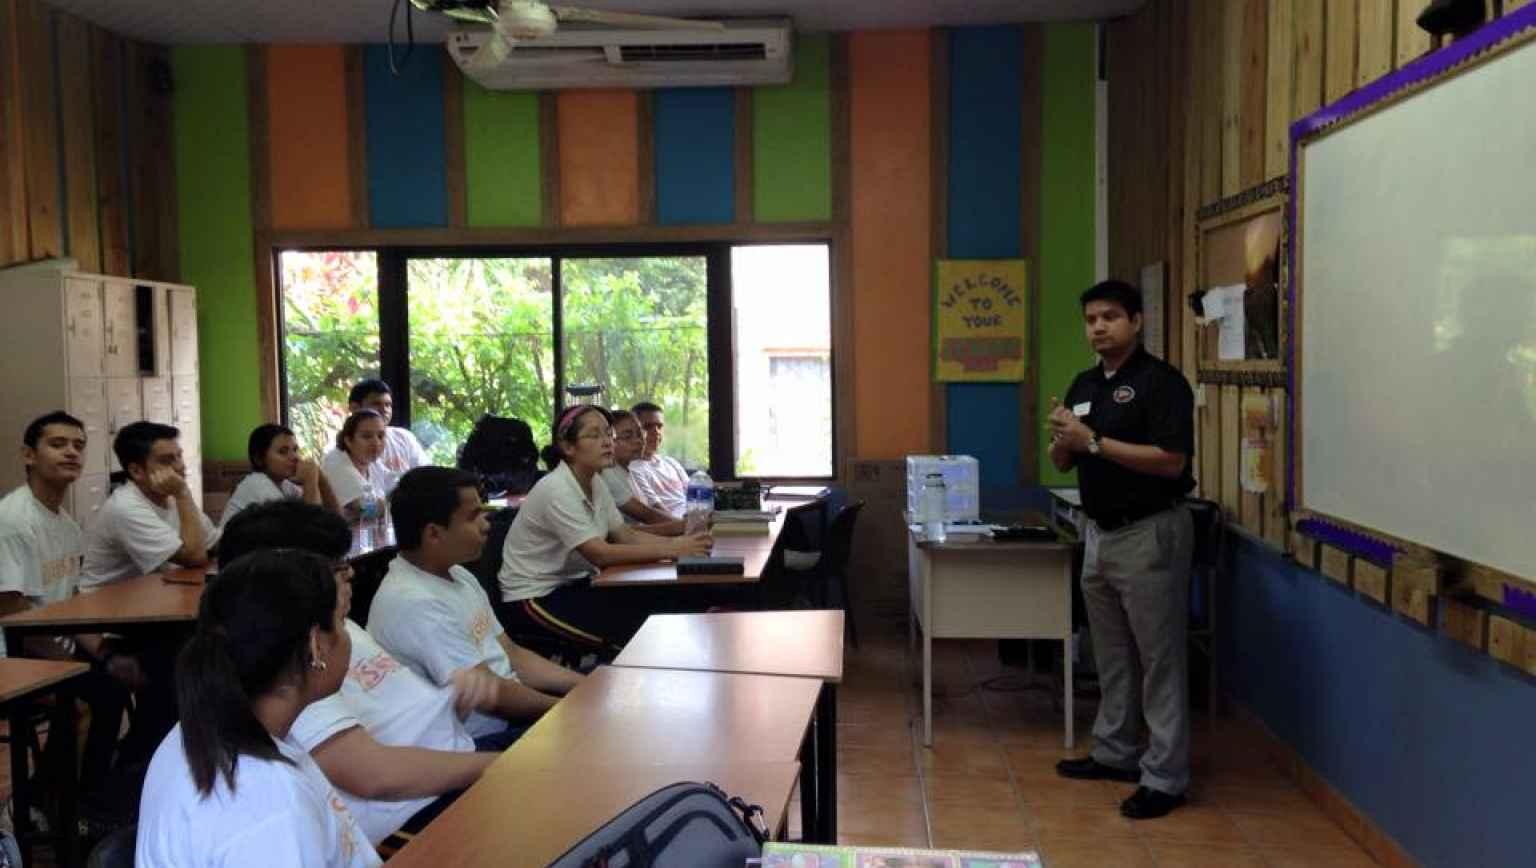 Homeland Security Degree >> EducationUSA advising center at Centro Cultural Sampedrano ...